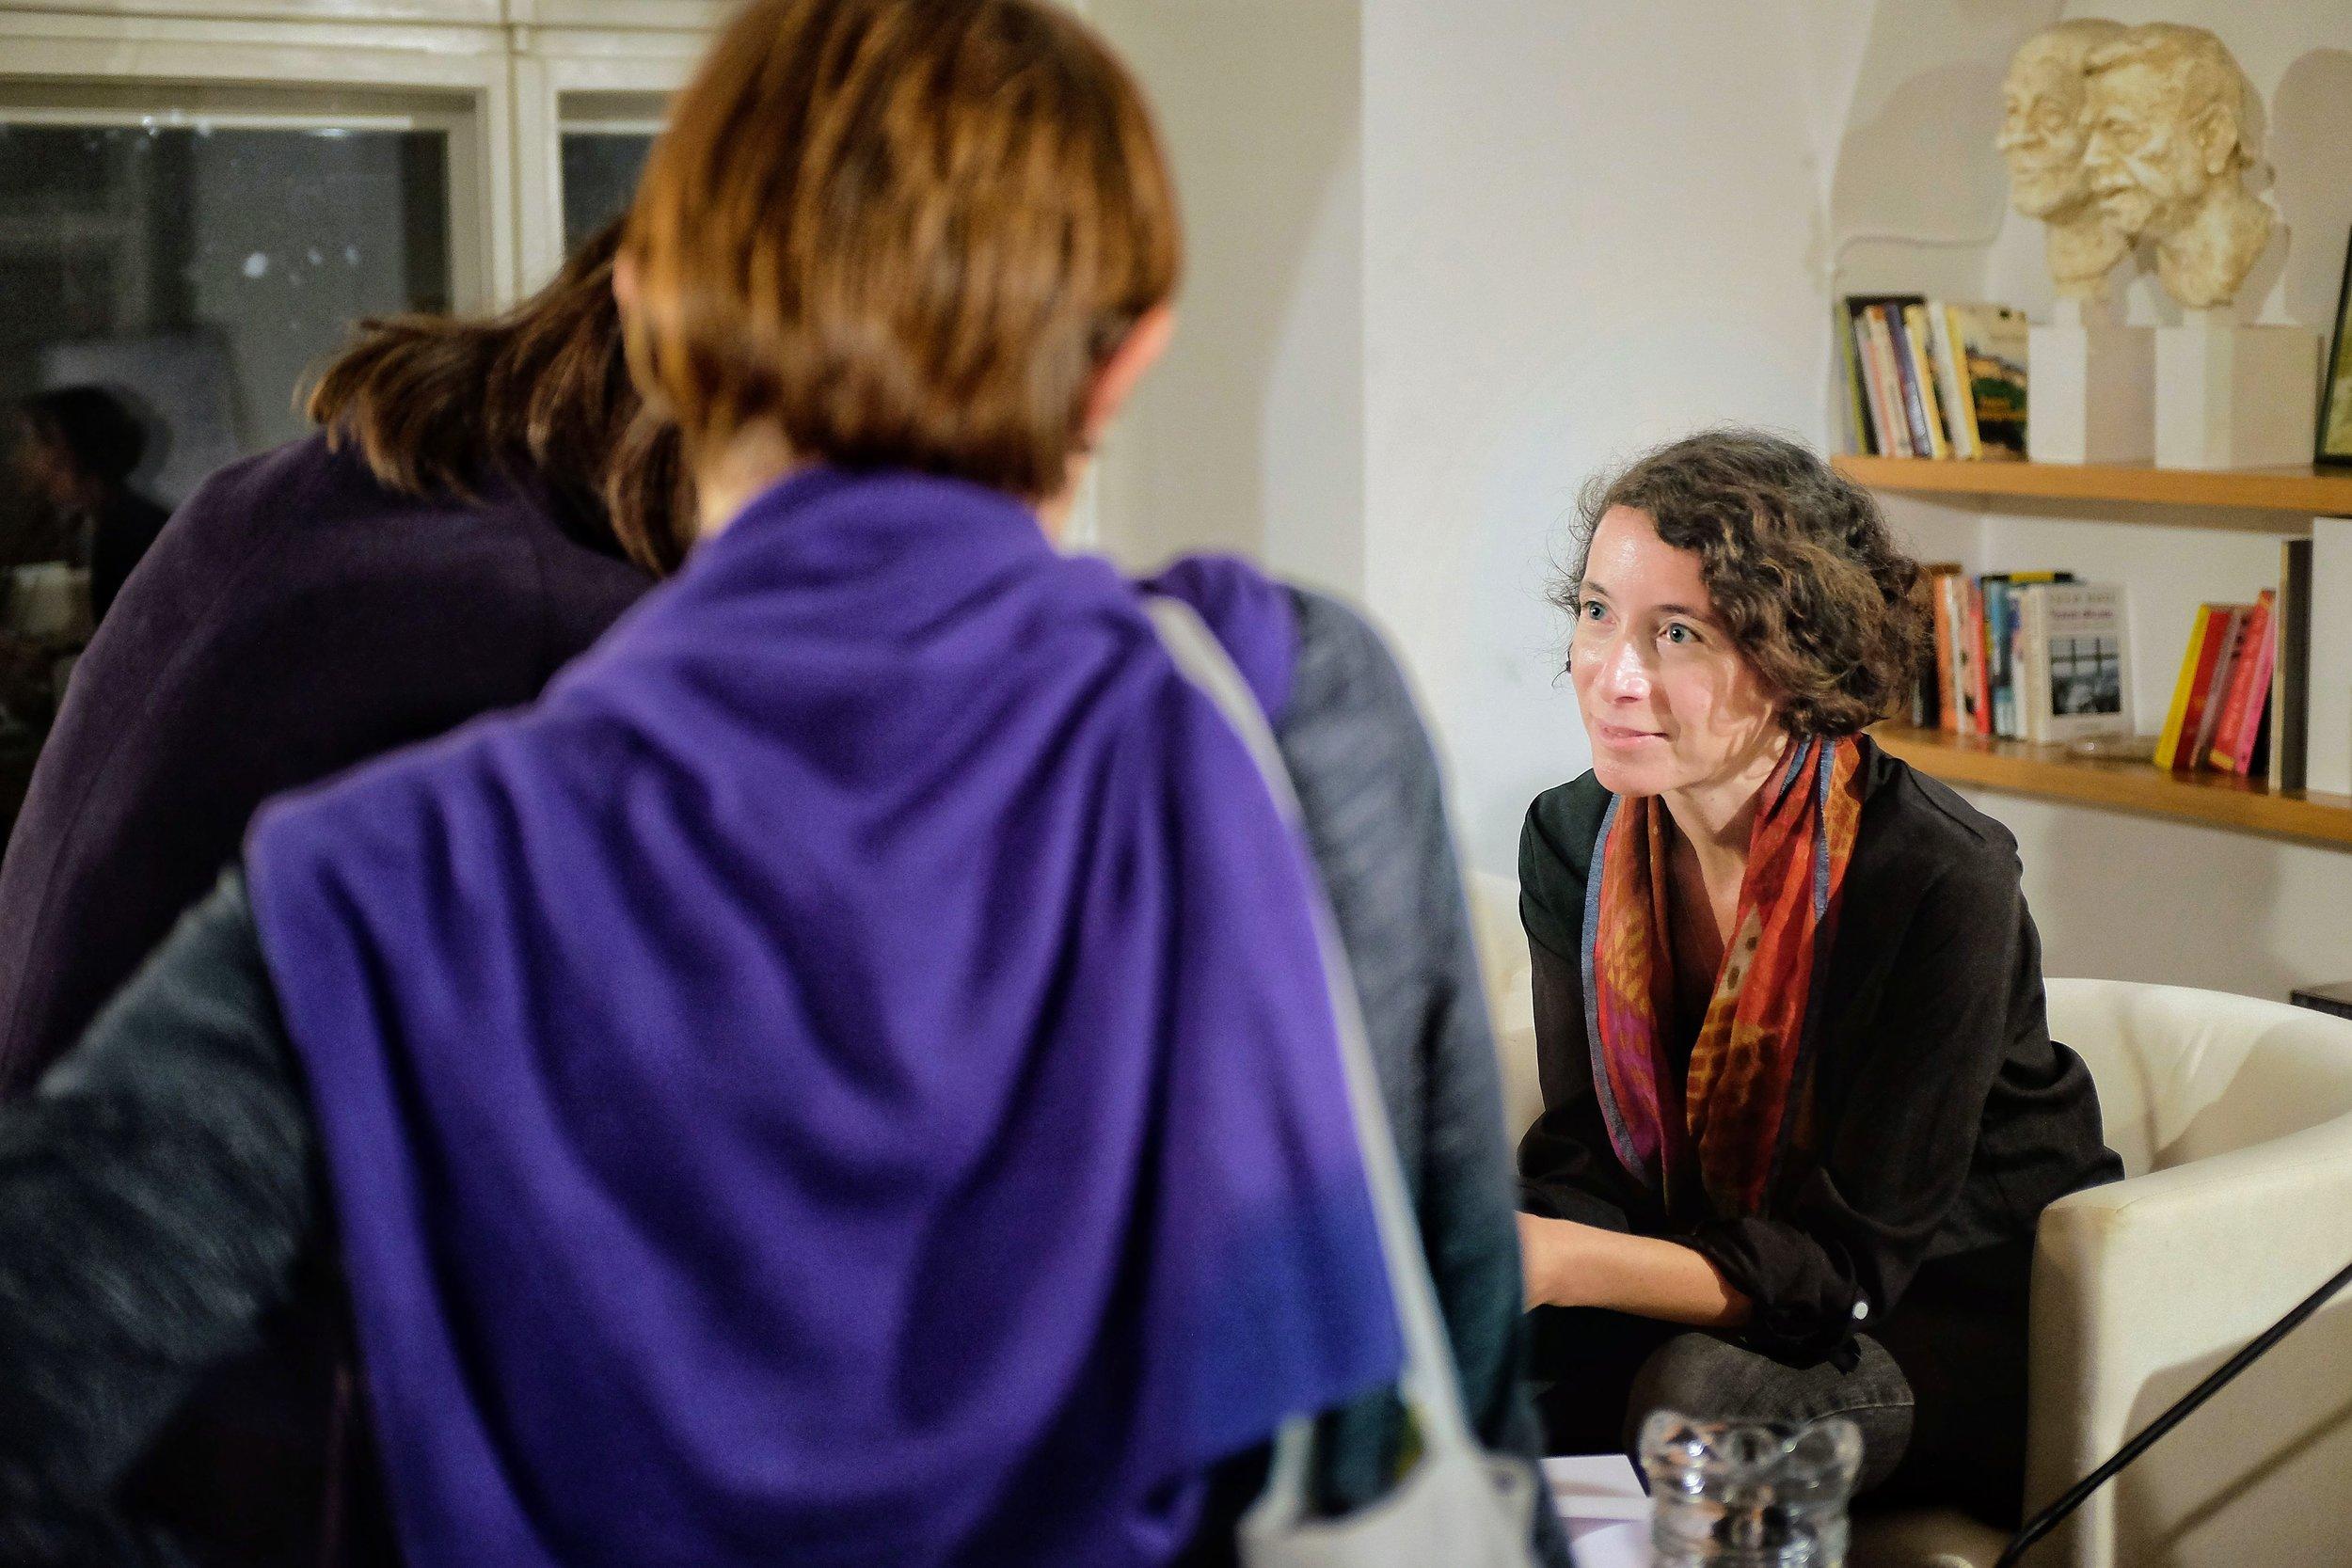 Ayelet Gundar-Goshen talks to readers at the Václav Havel Library in Prague, 8.10.2018.